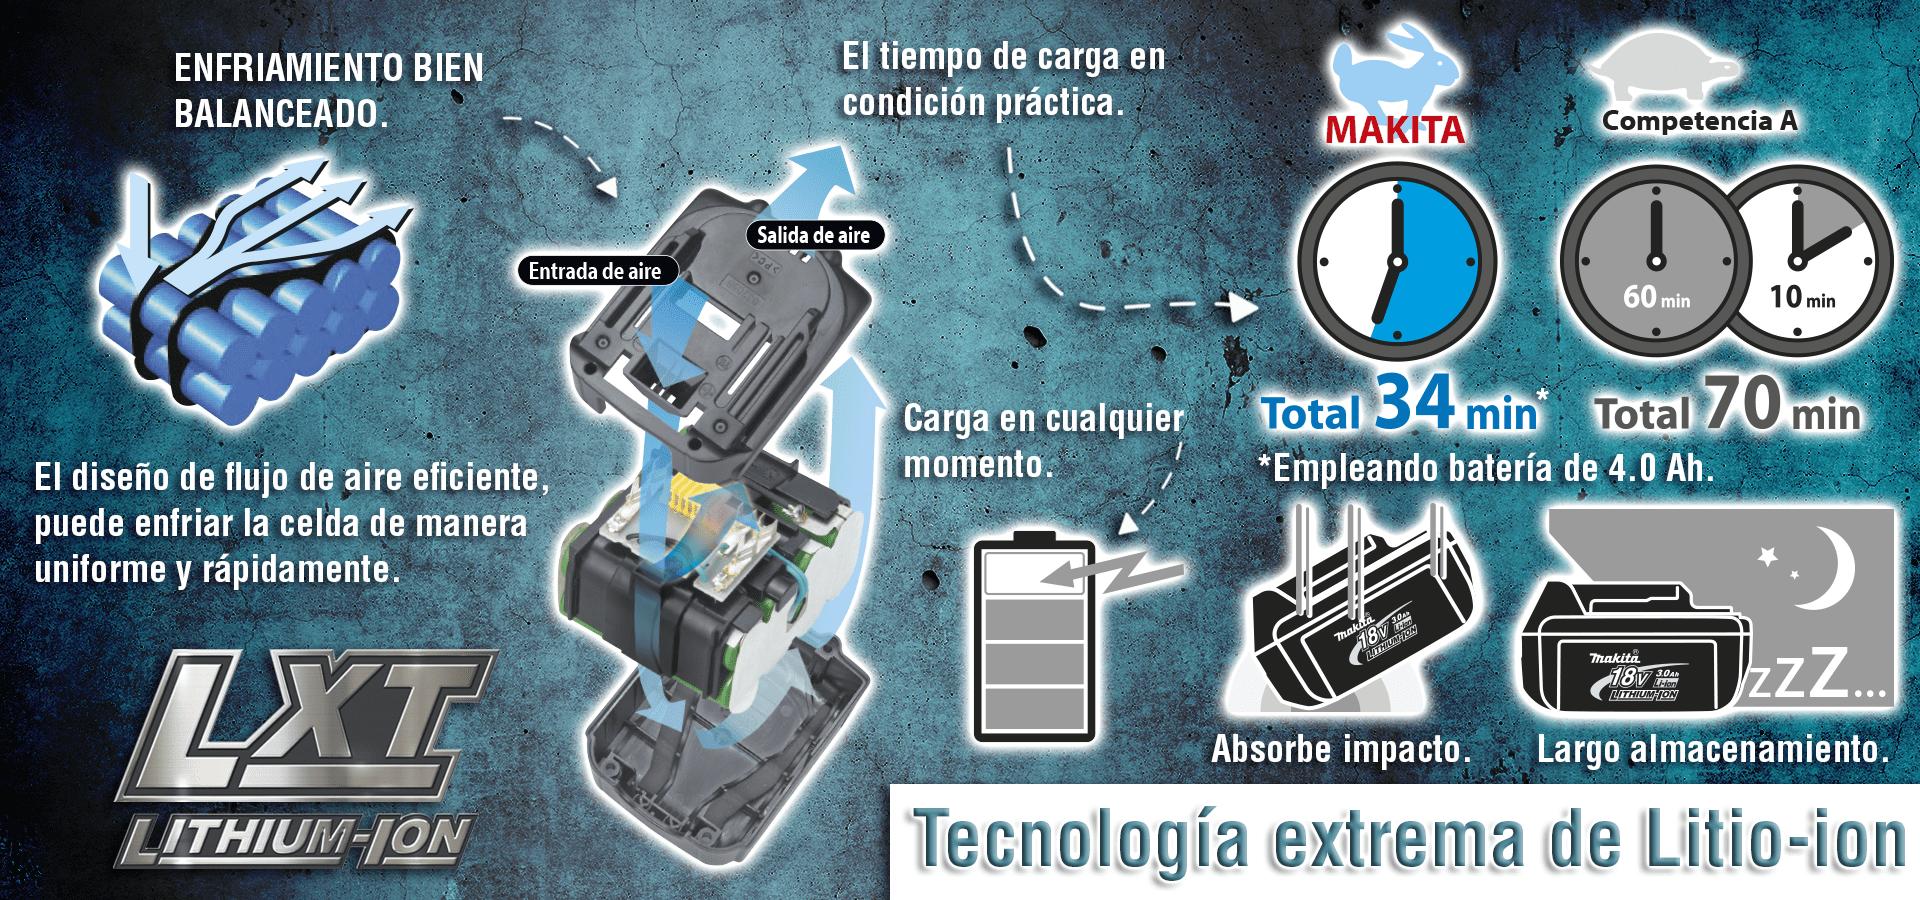 Infografia_LXT